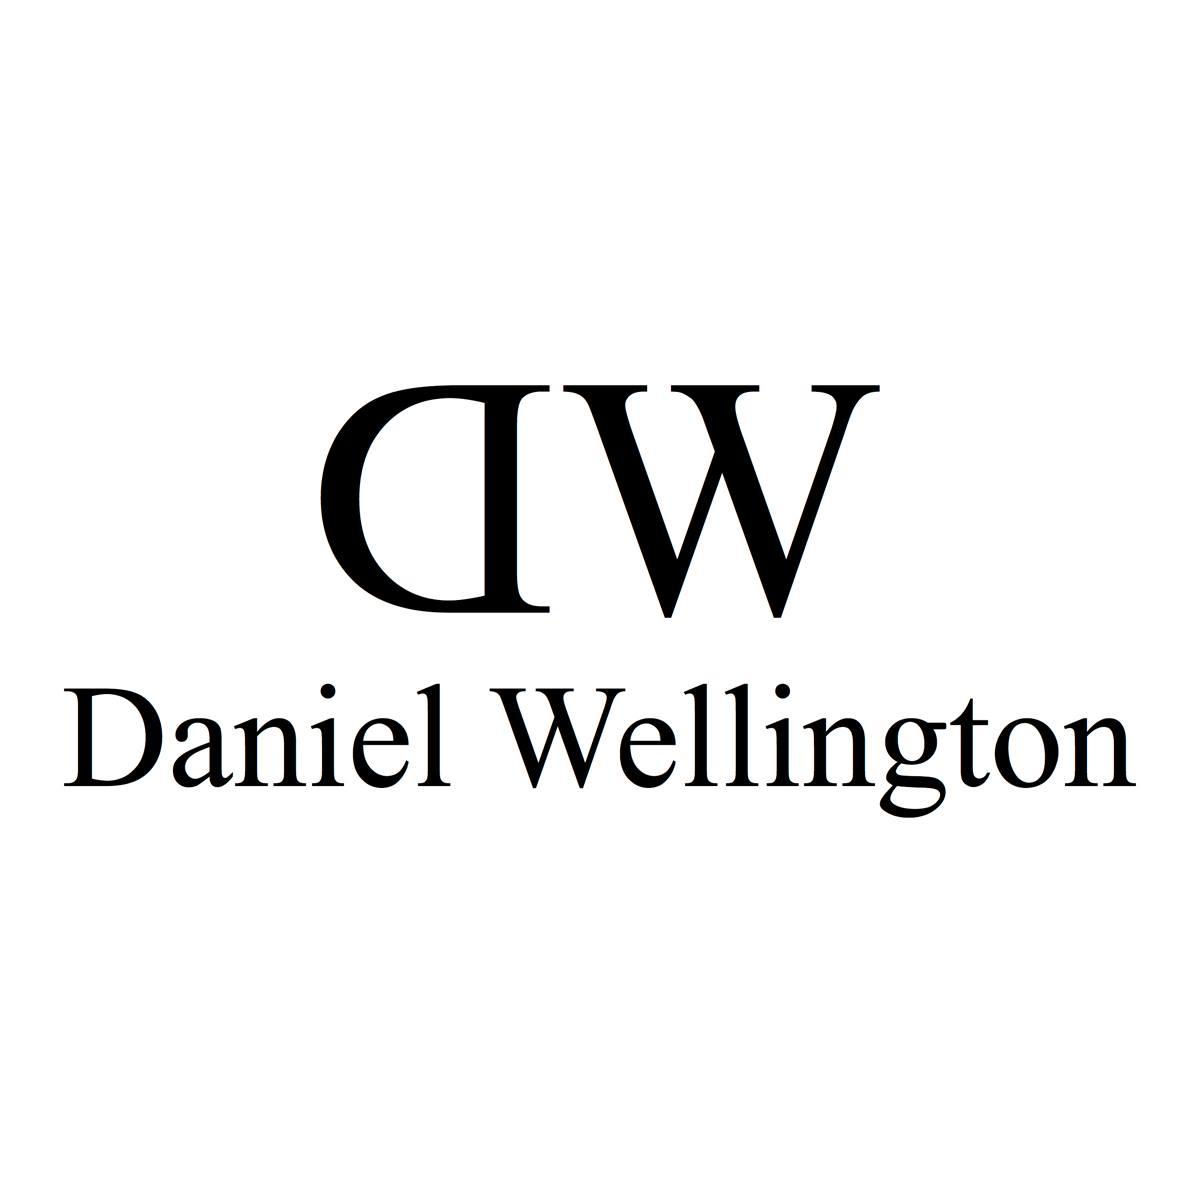 Daniel Wellington (2017)